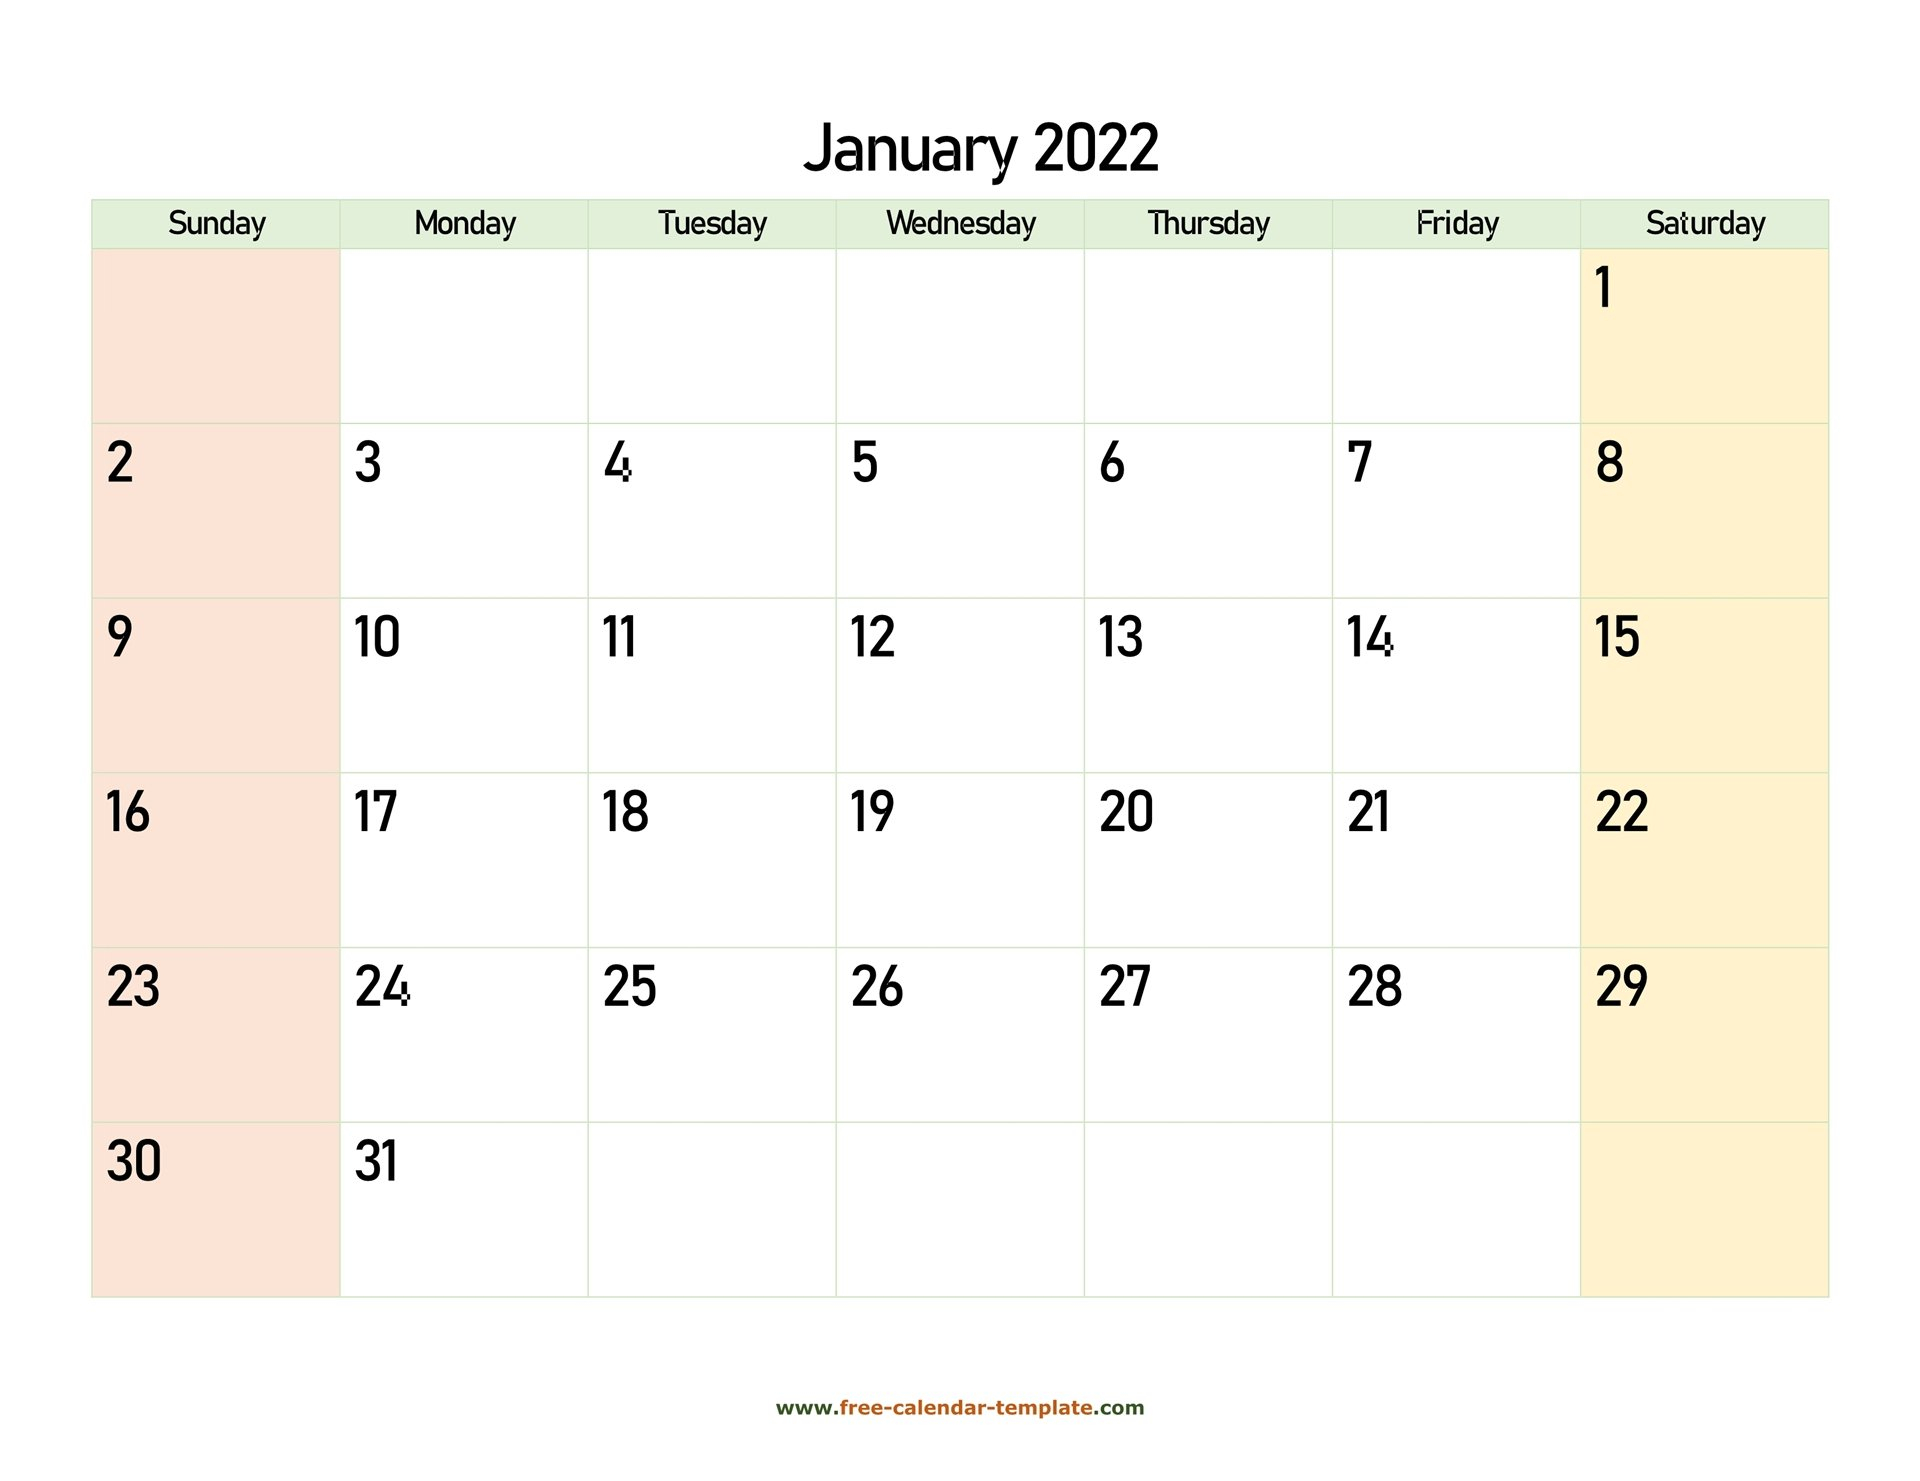 January 2022 Free Calendar Tempplate   Free-Calendar in January 2022 Calendar Printable Free Graphics